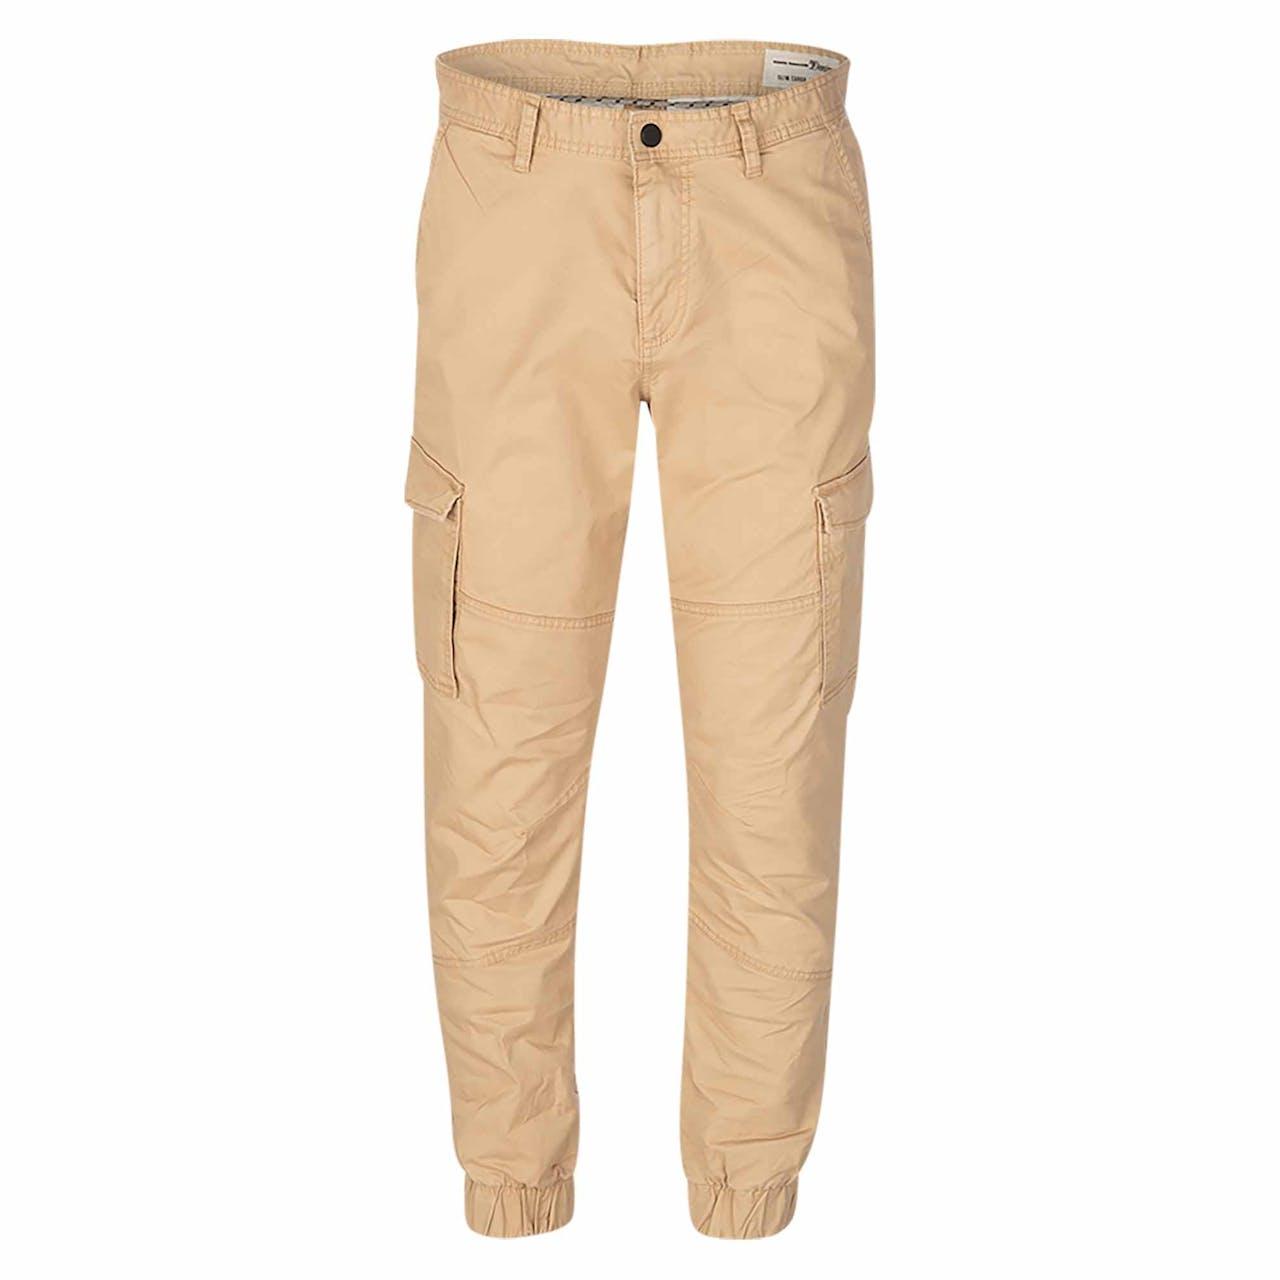 Cargohose - Slim Fit - Unifarben